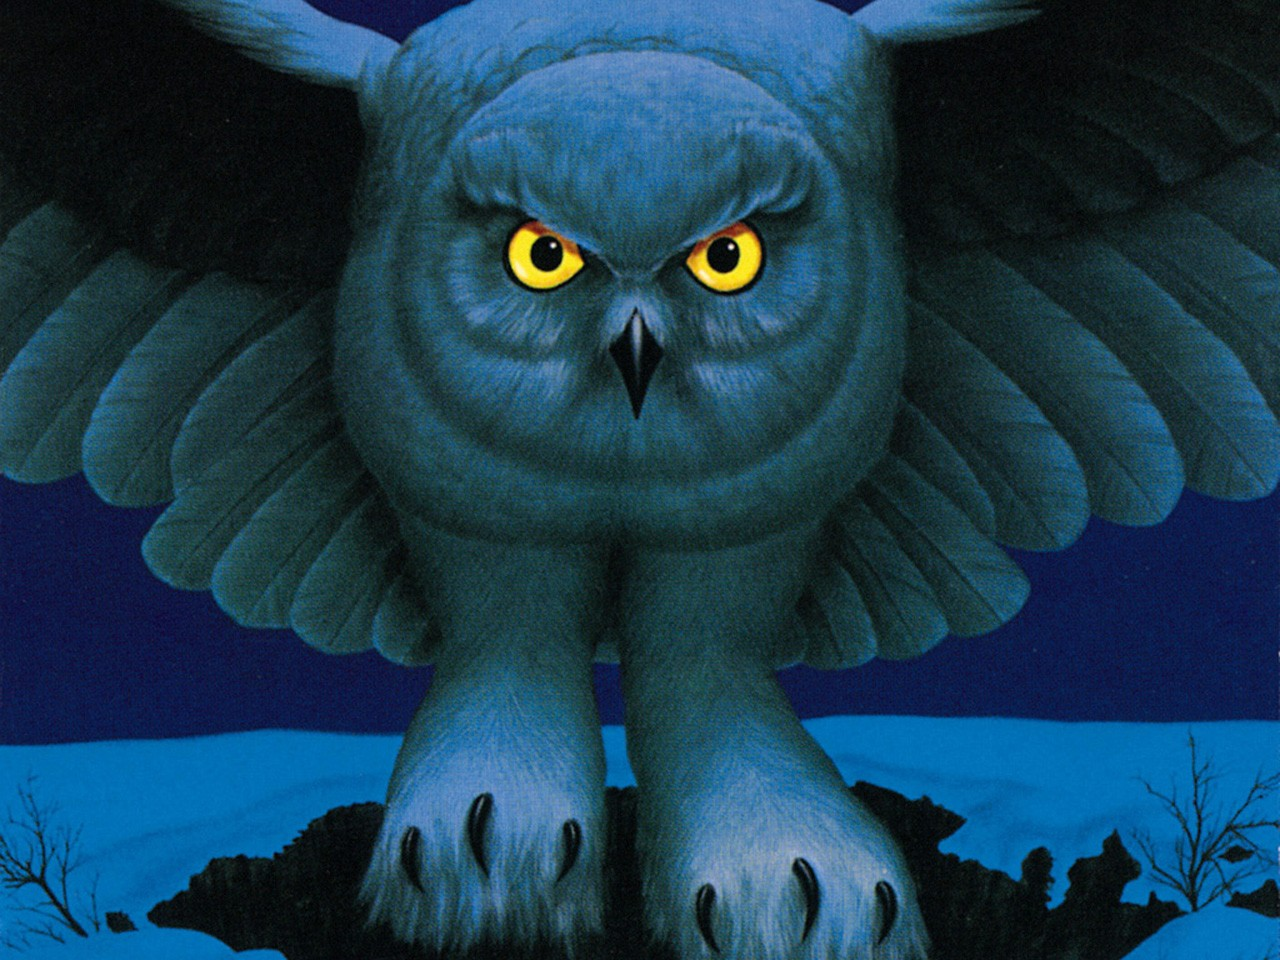 Birds Rush Wallpaper 1280x960 Birds Rush Owls Album Covers Alex 1280x960